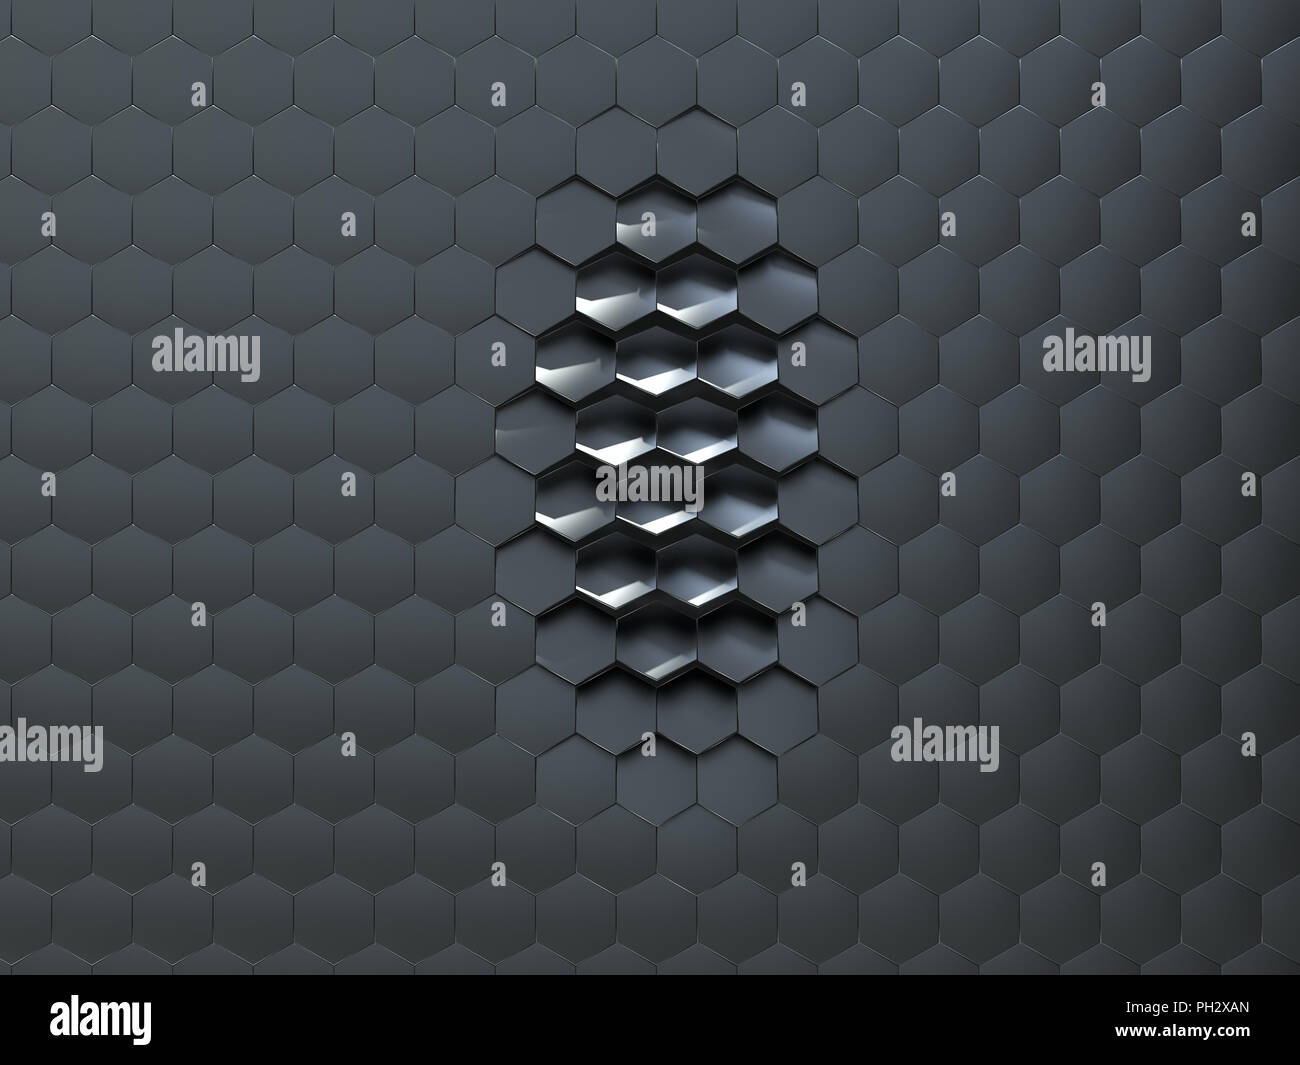 artificial hexagonal surface - Stock Image